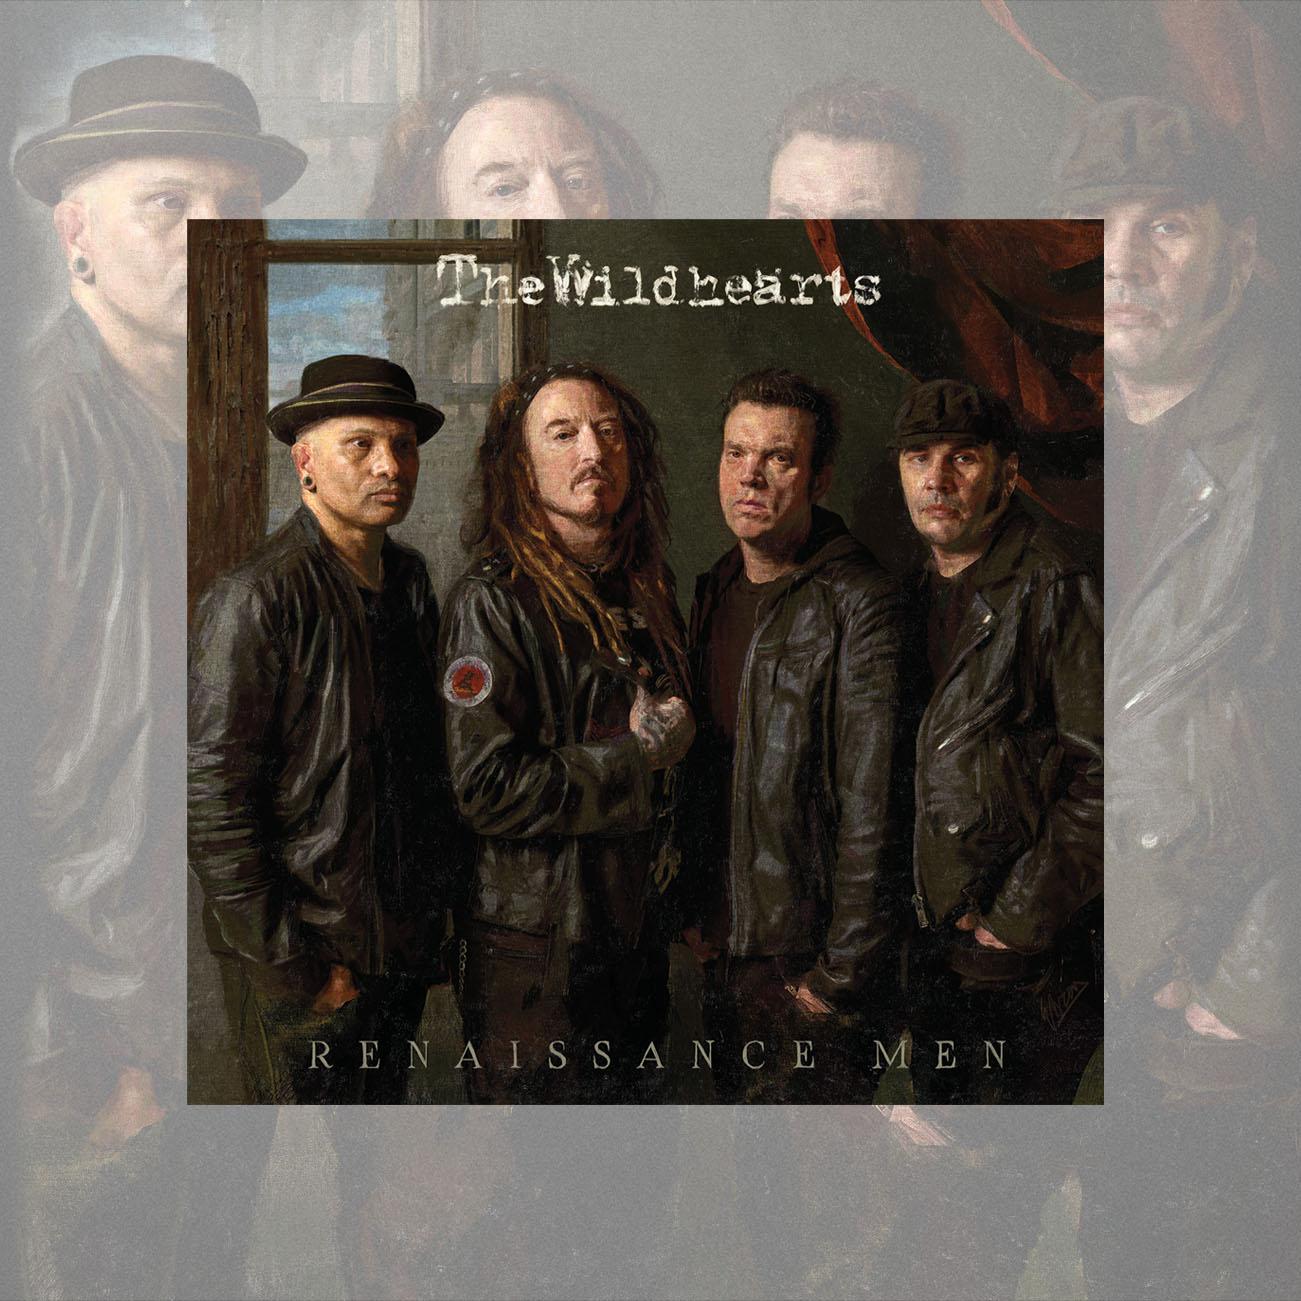 The Wildhearts - 'Renaissance Men' Jewelcase CD - The Wildhearts